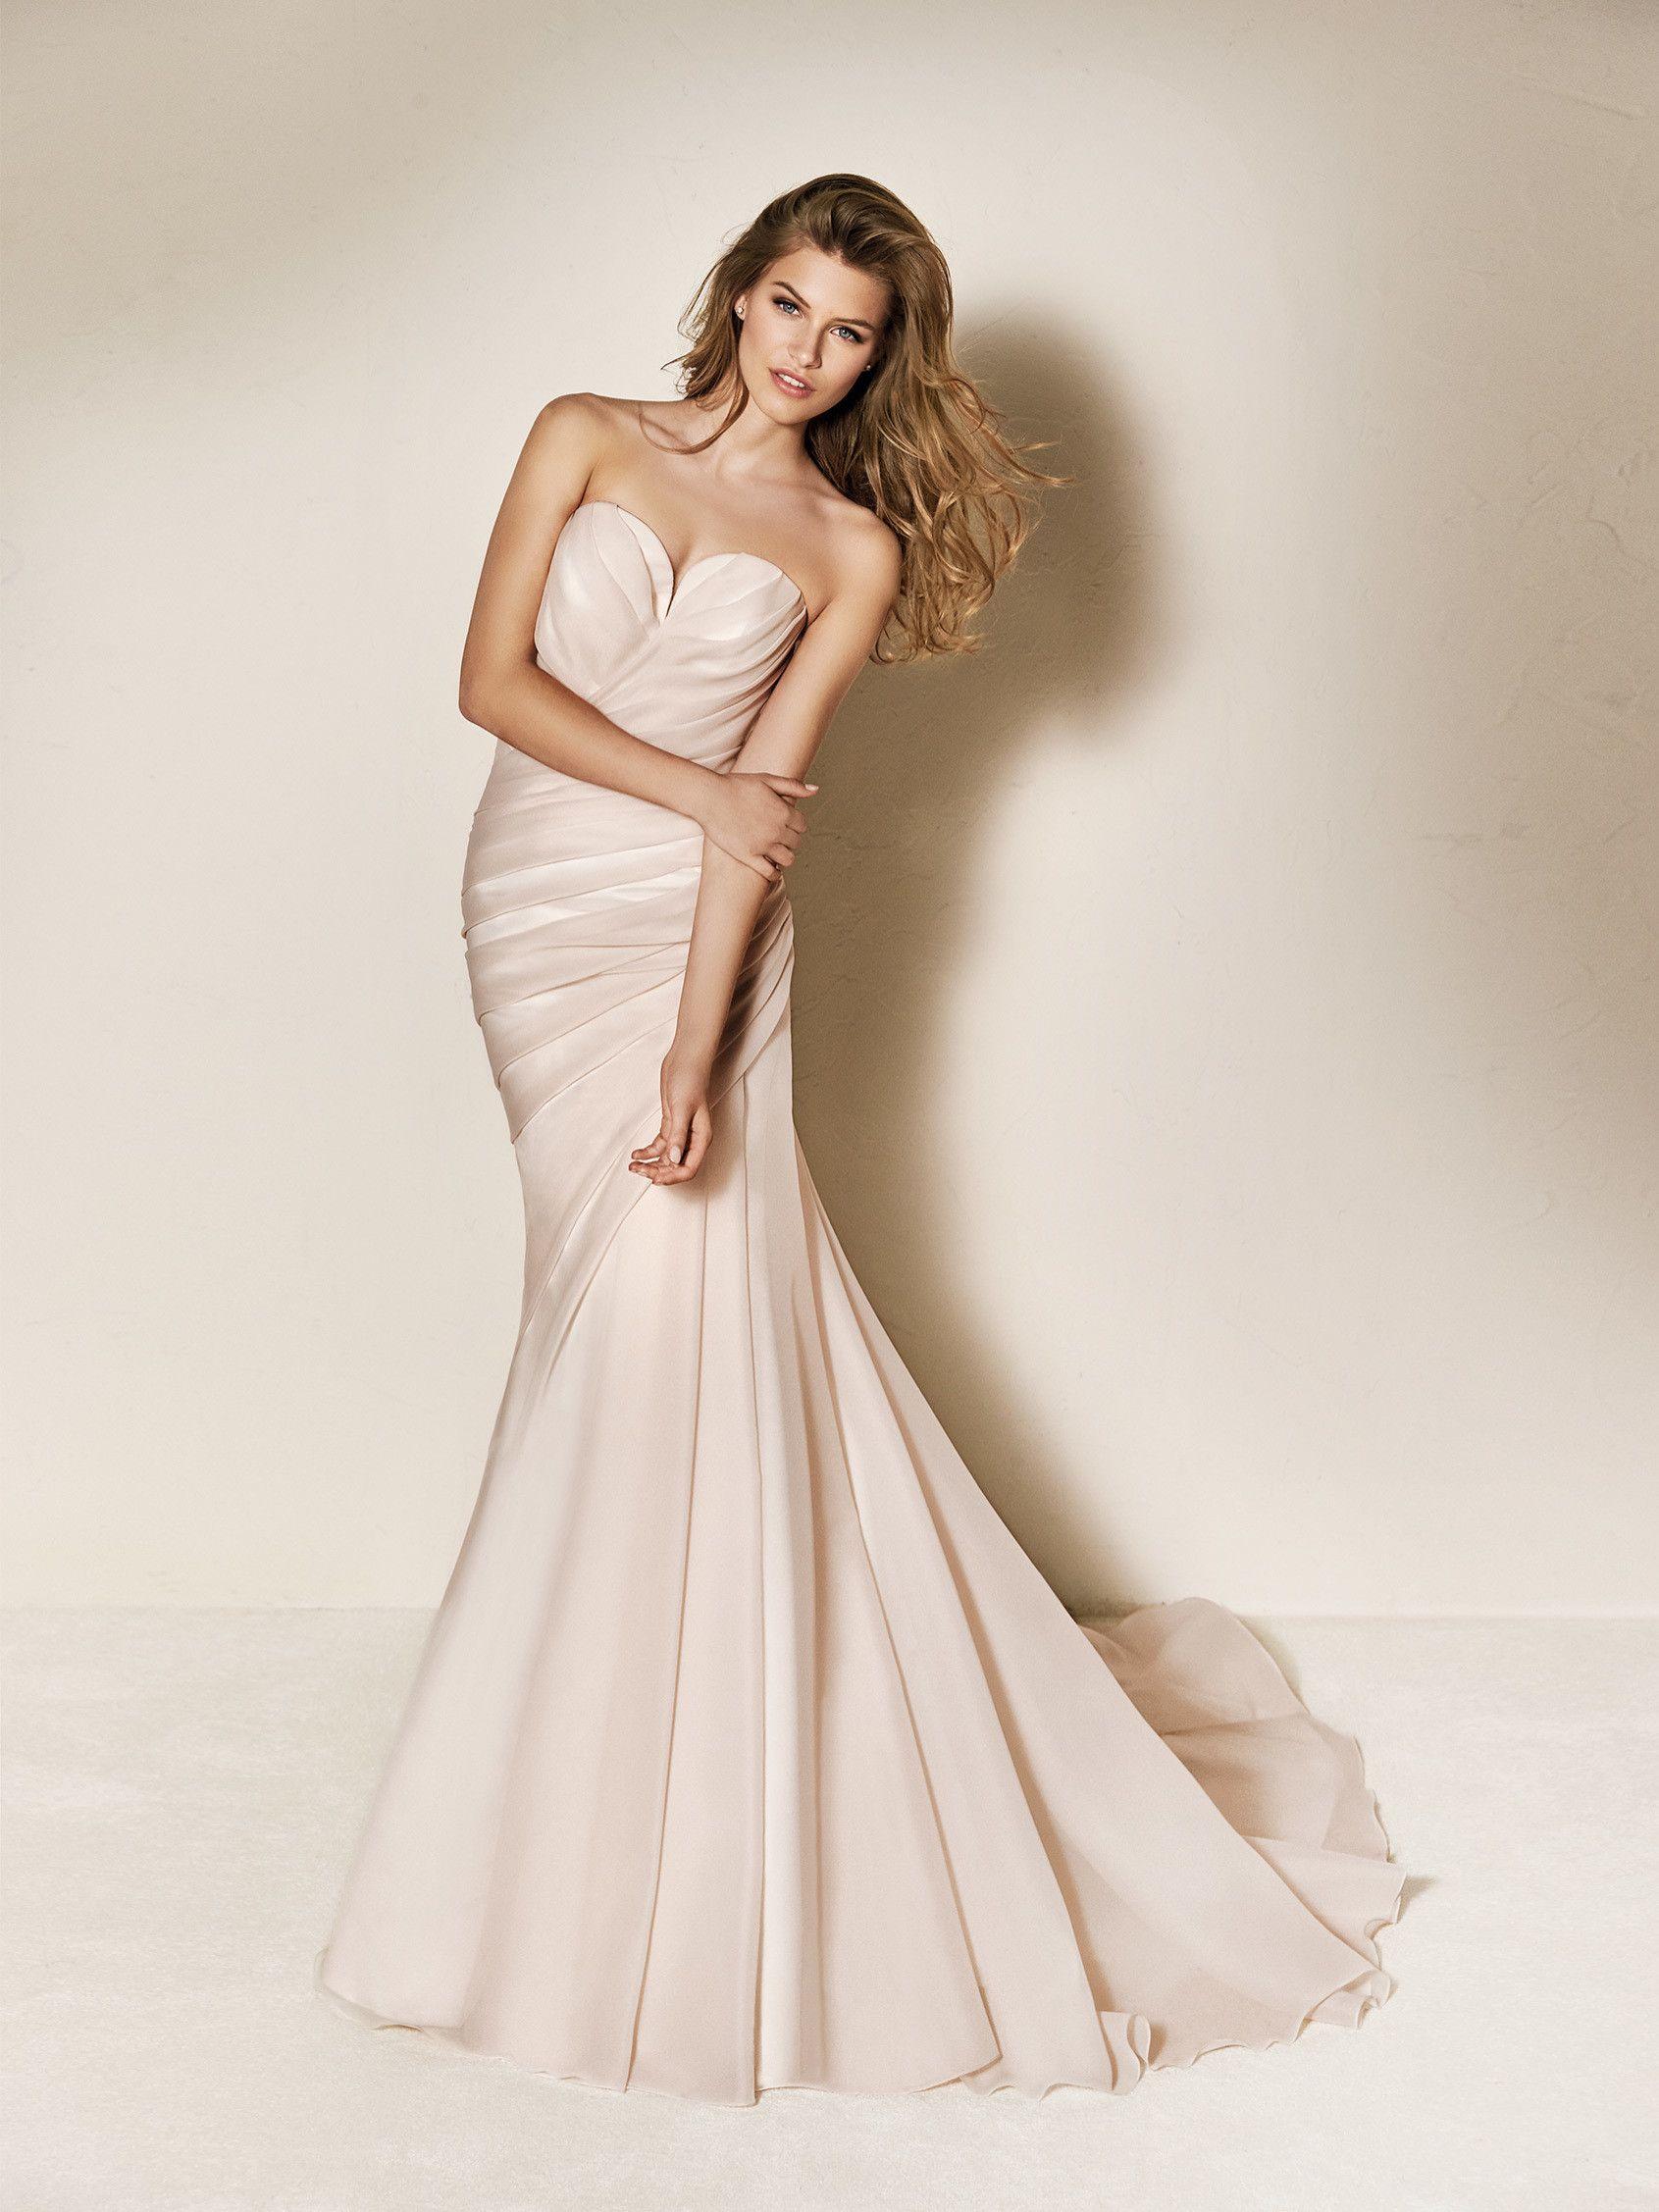 Mermaid dress wedding  Wedding dress pink  Pronovias  Collection  Tiffany Carter